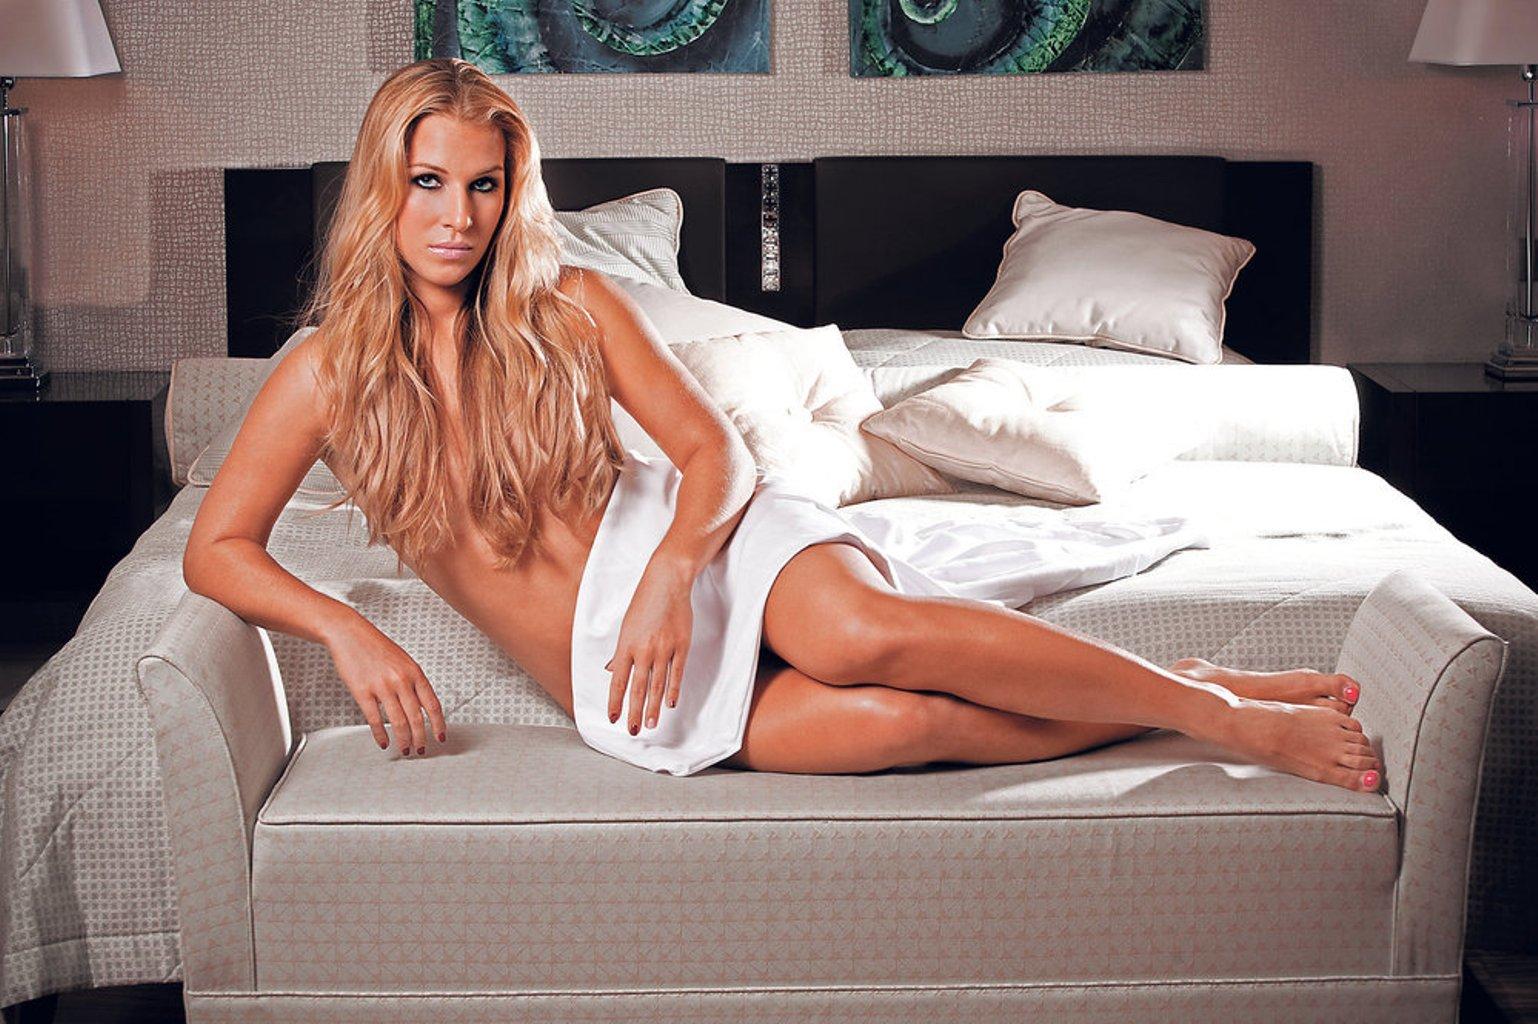 Dominika-Cibulkova-again-naked-2-tennis-27376693-1538-1024